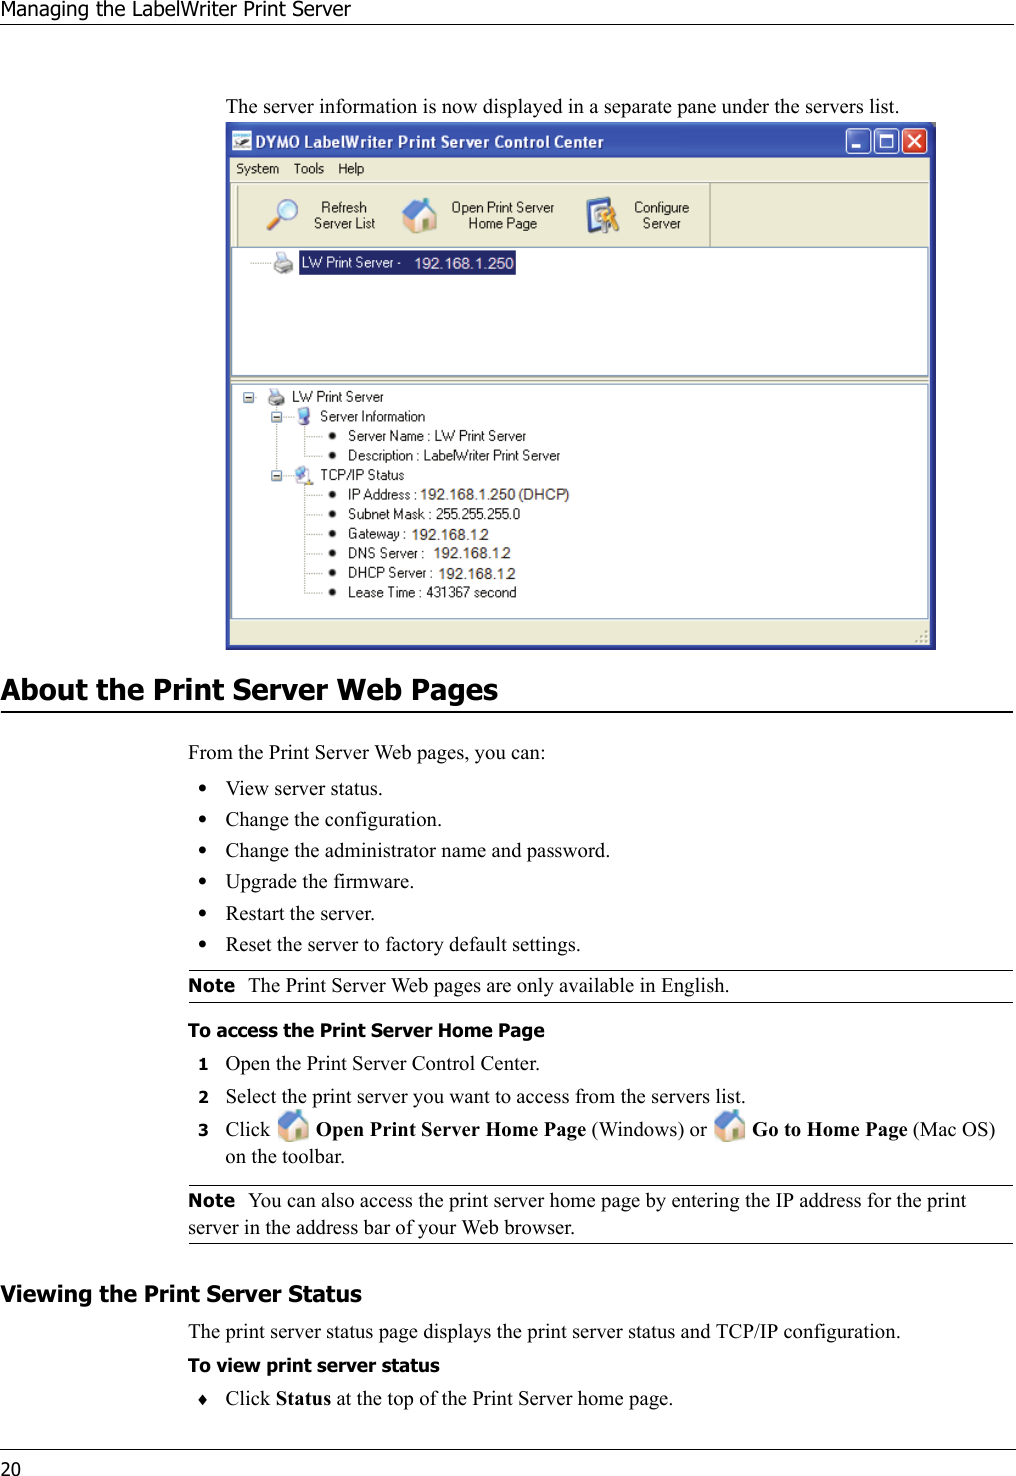 LabelZone Dymo Printserver LabelWriter Print Server User